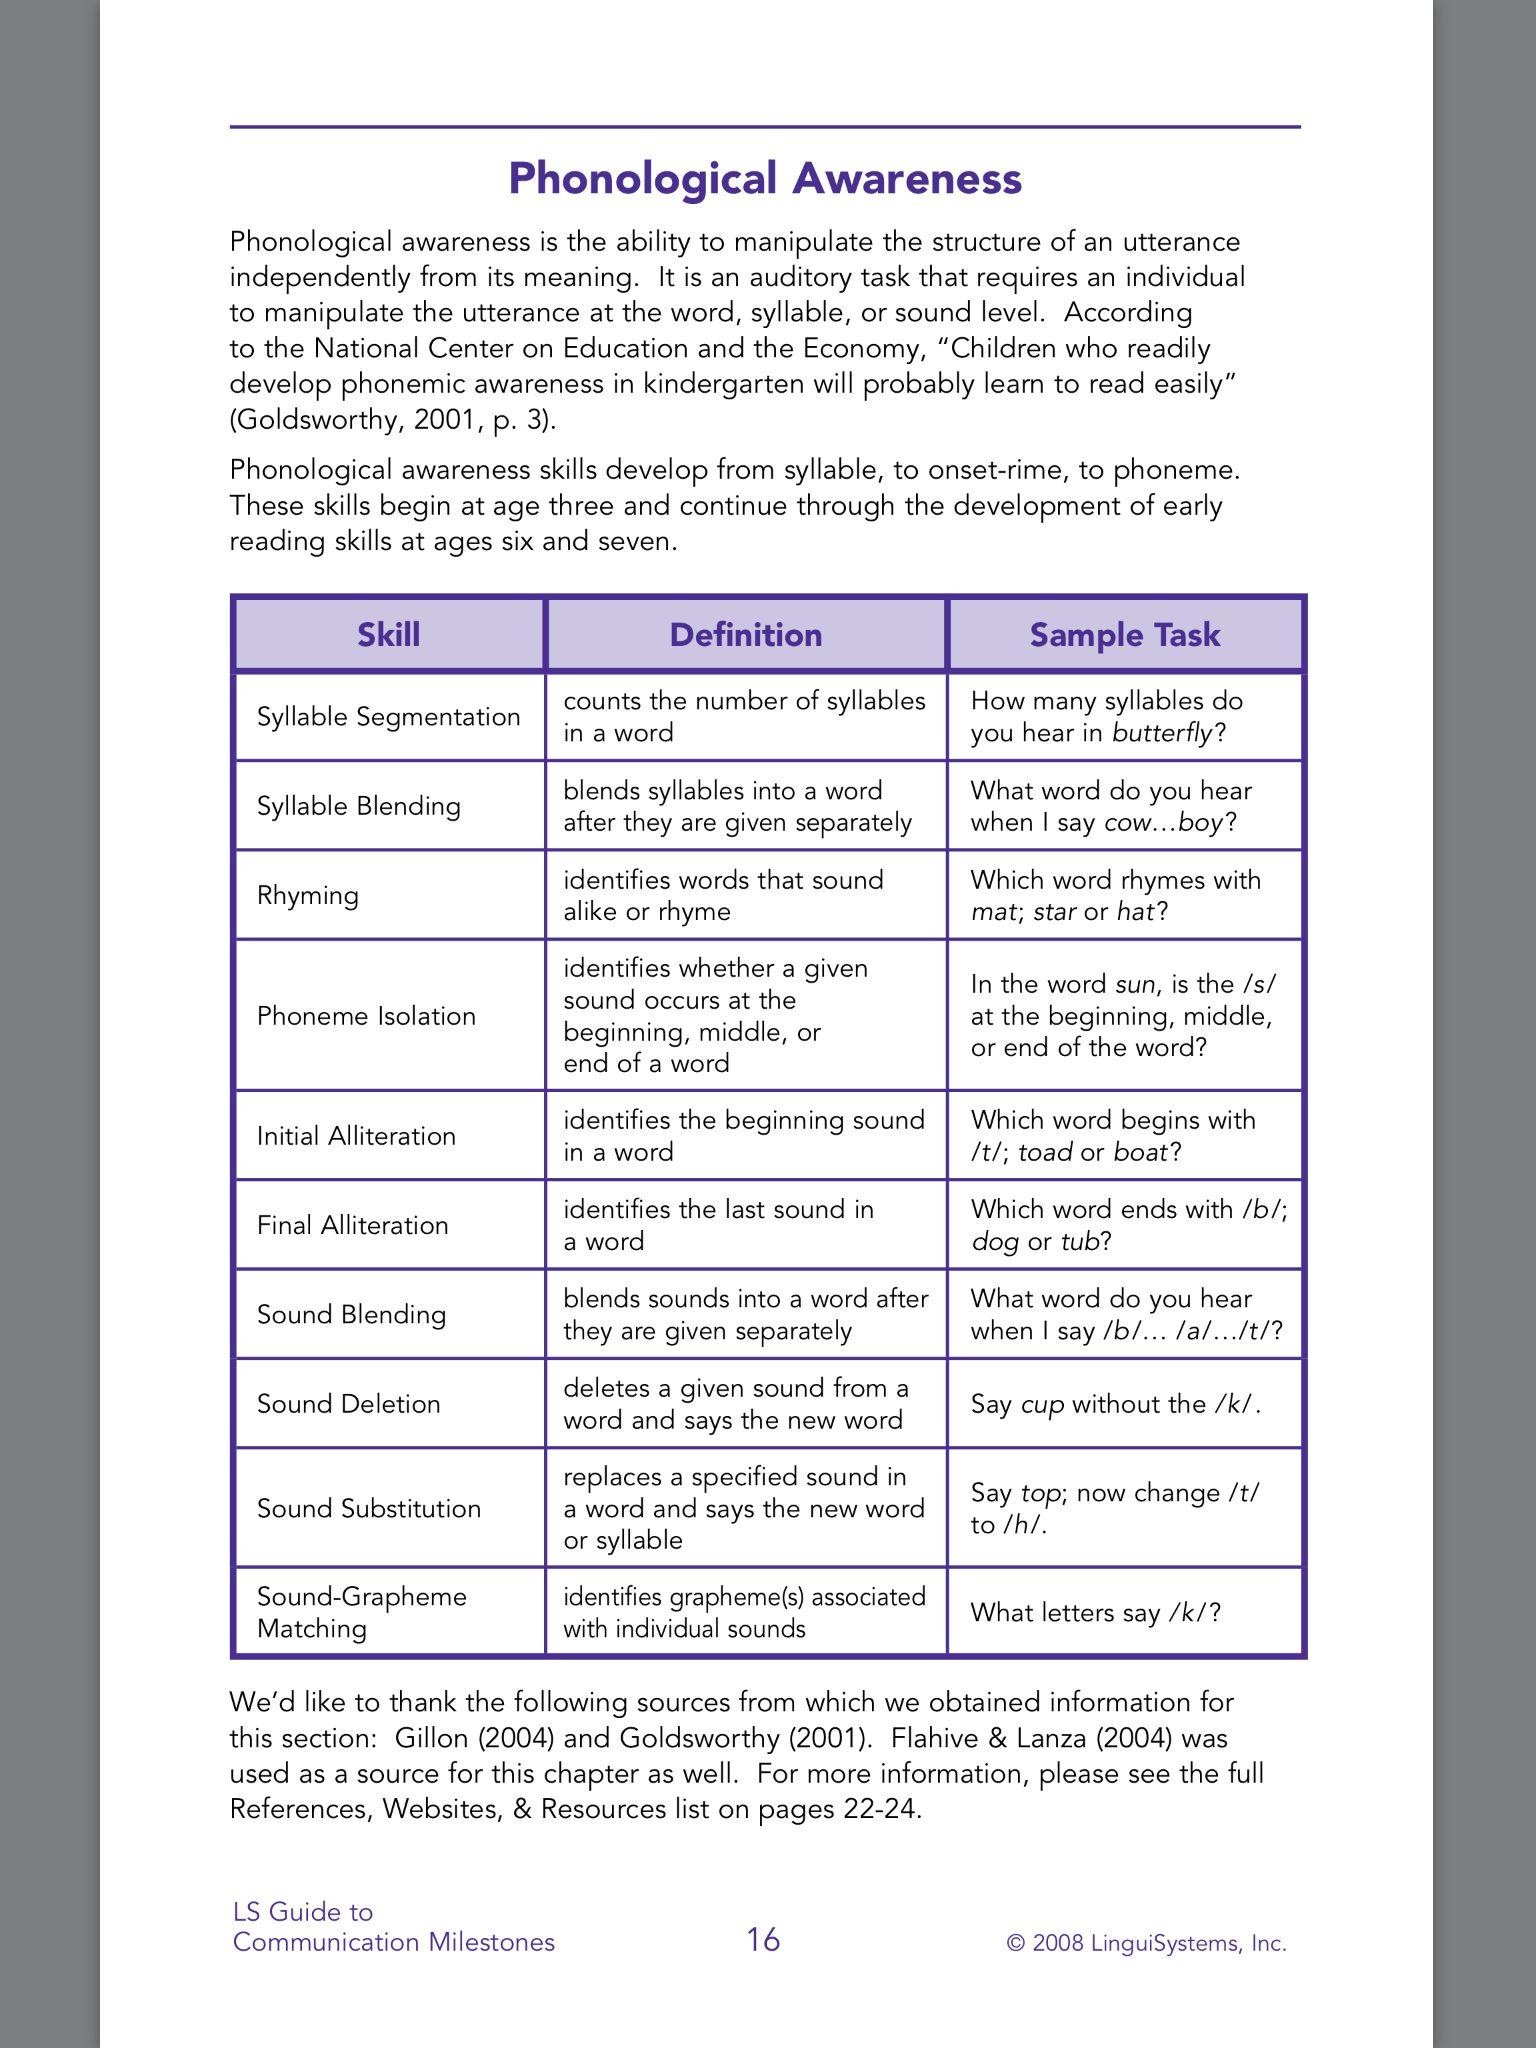 Phonological Awareness Hierarchy